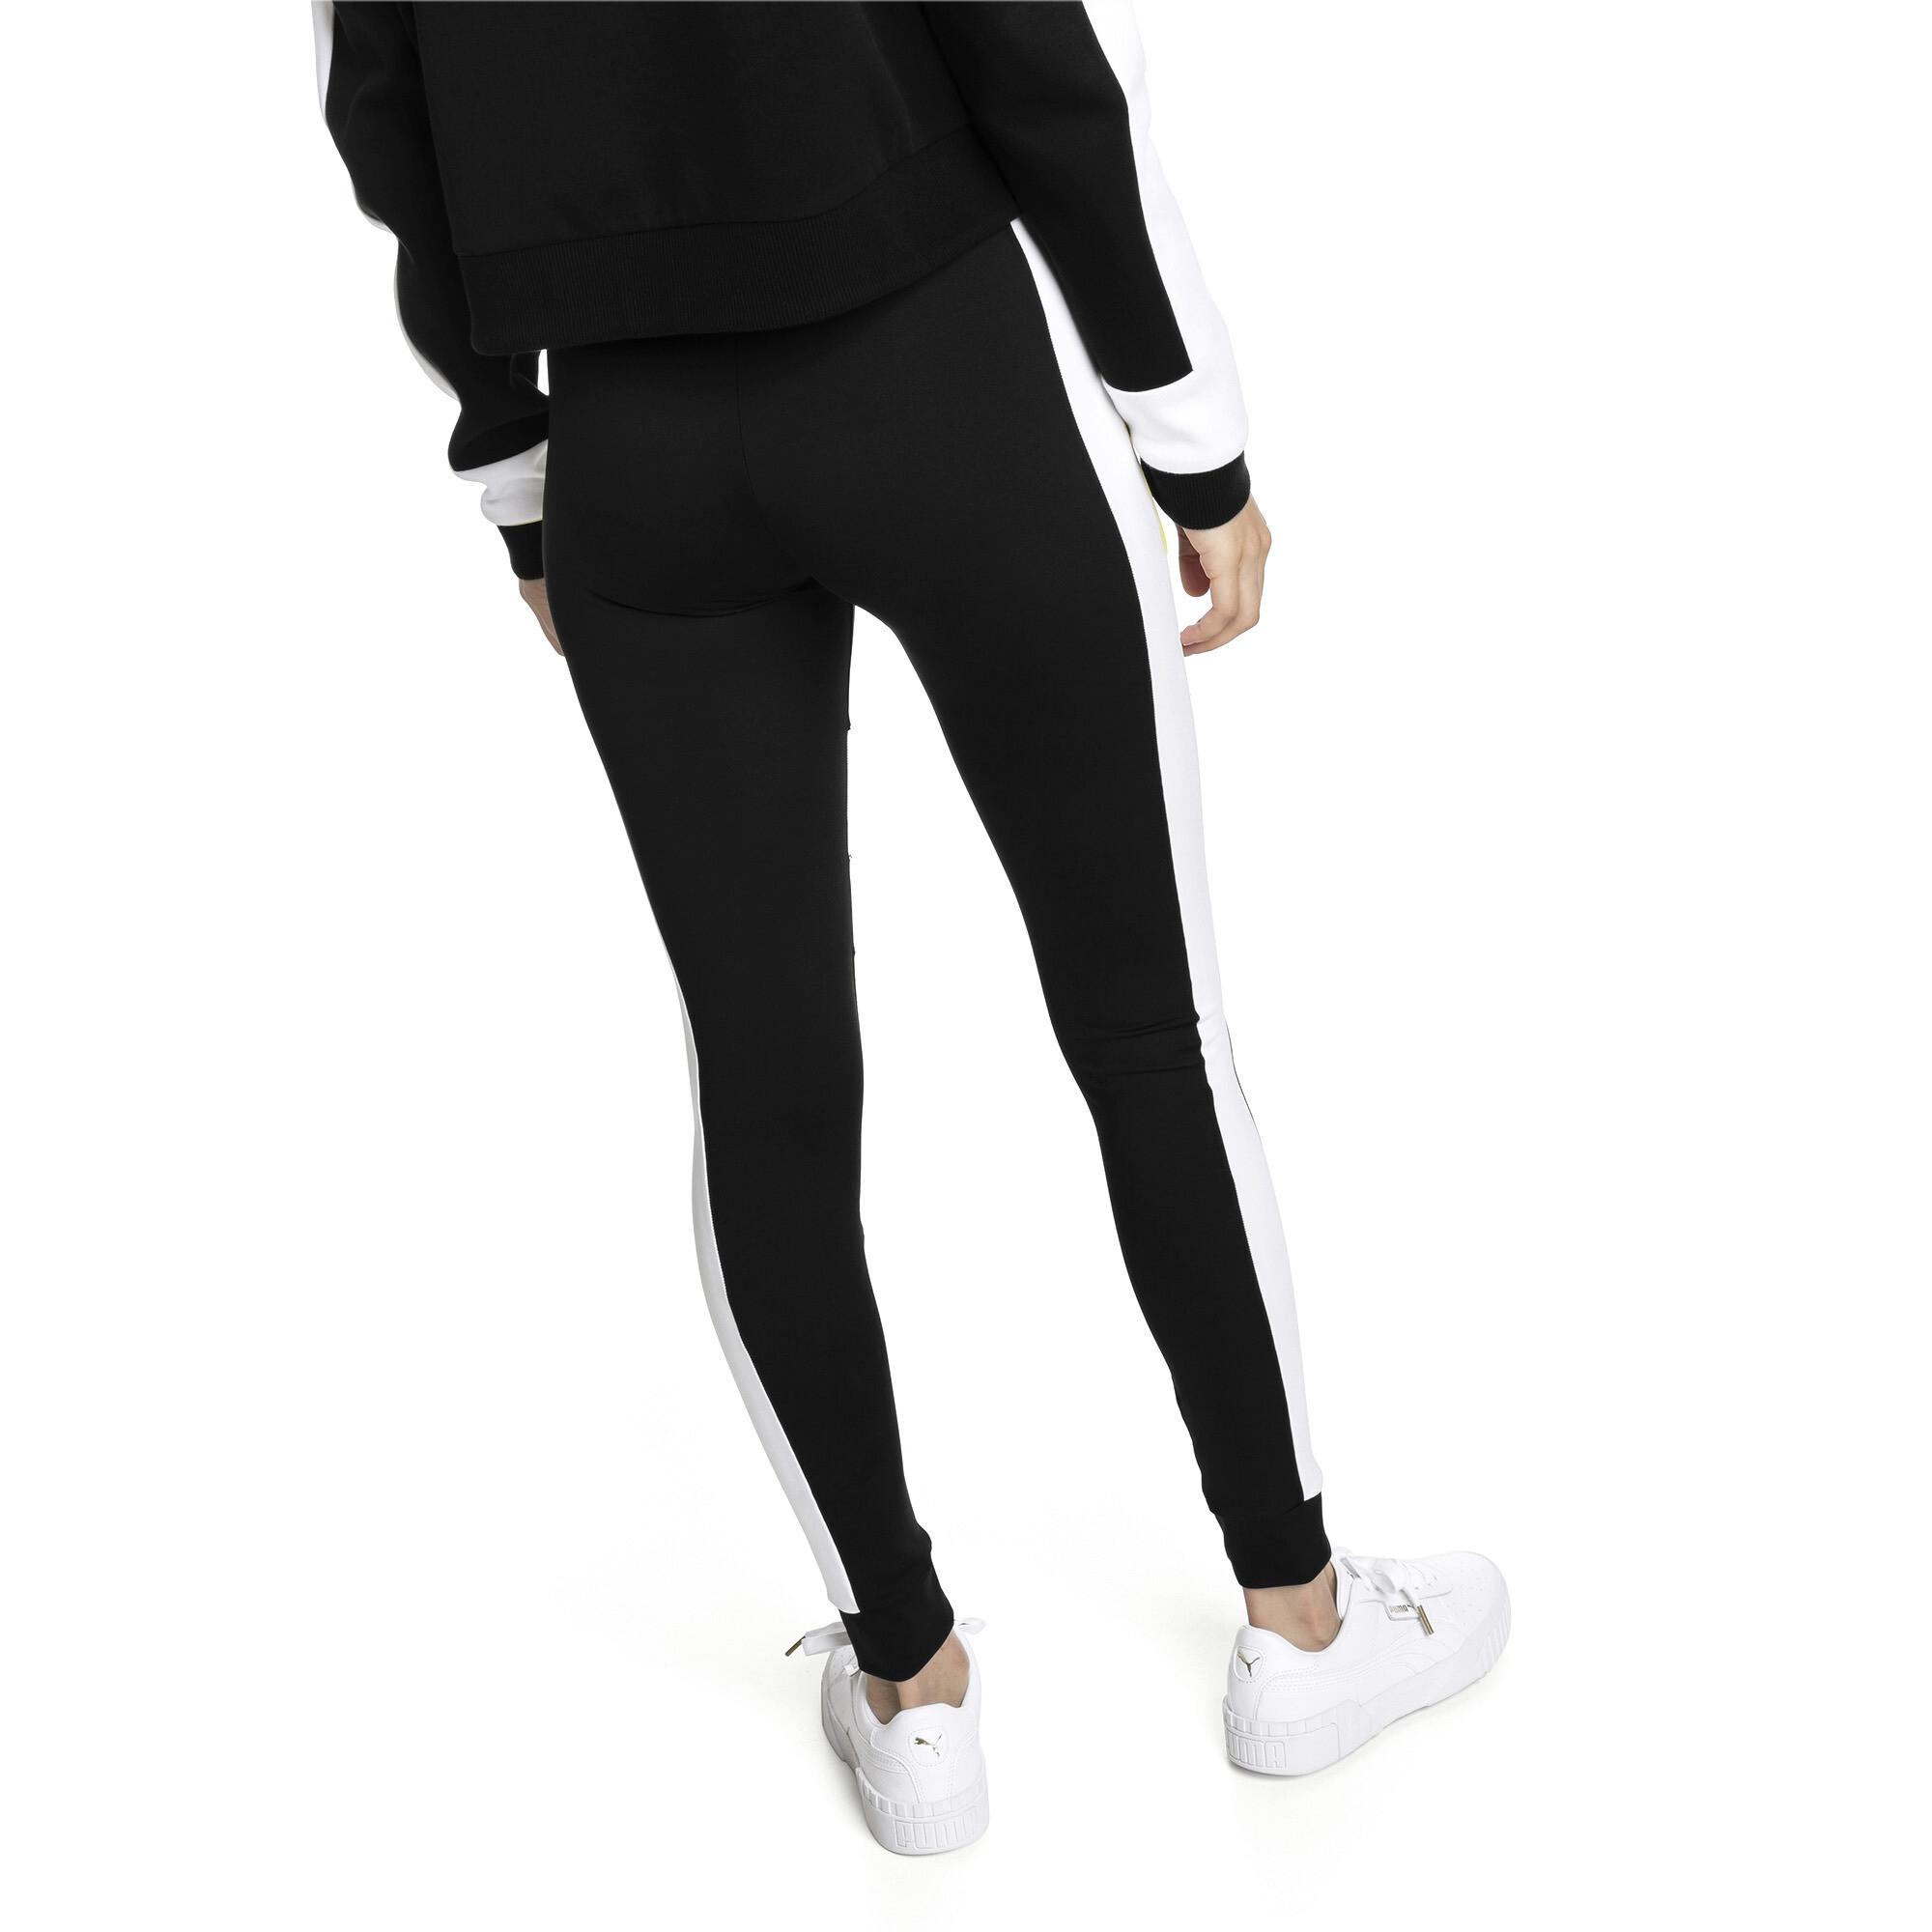 c7c178463b5b7 Chase Women's Leggings   10 - Black   Puma